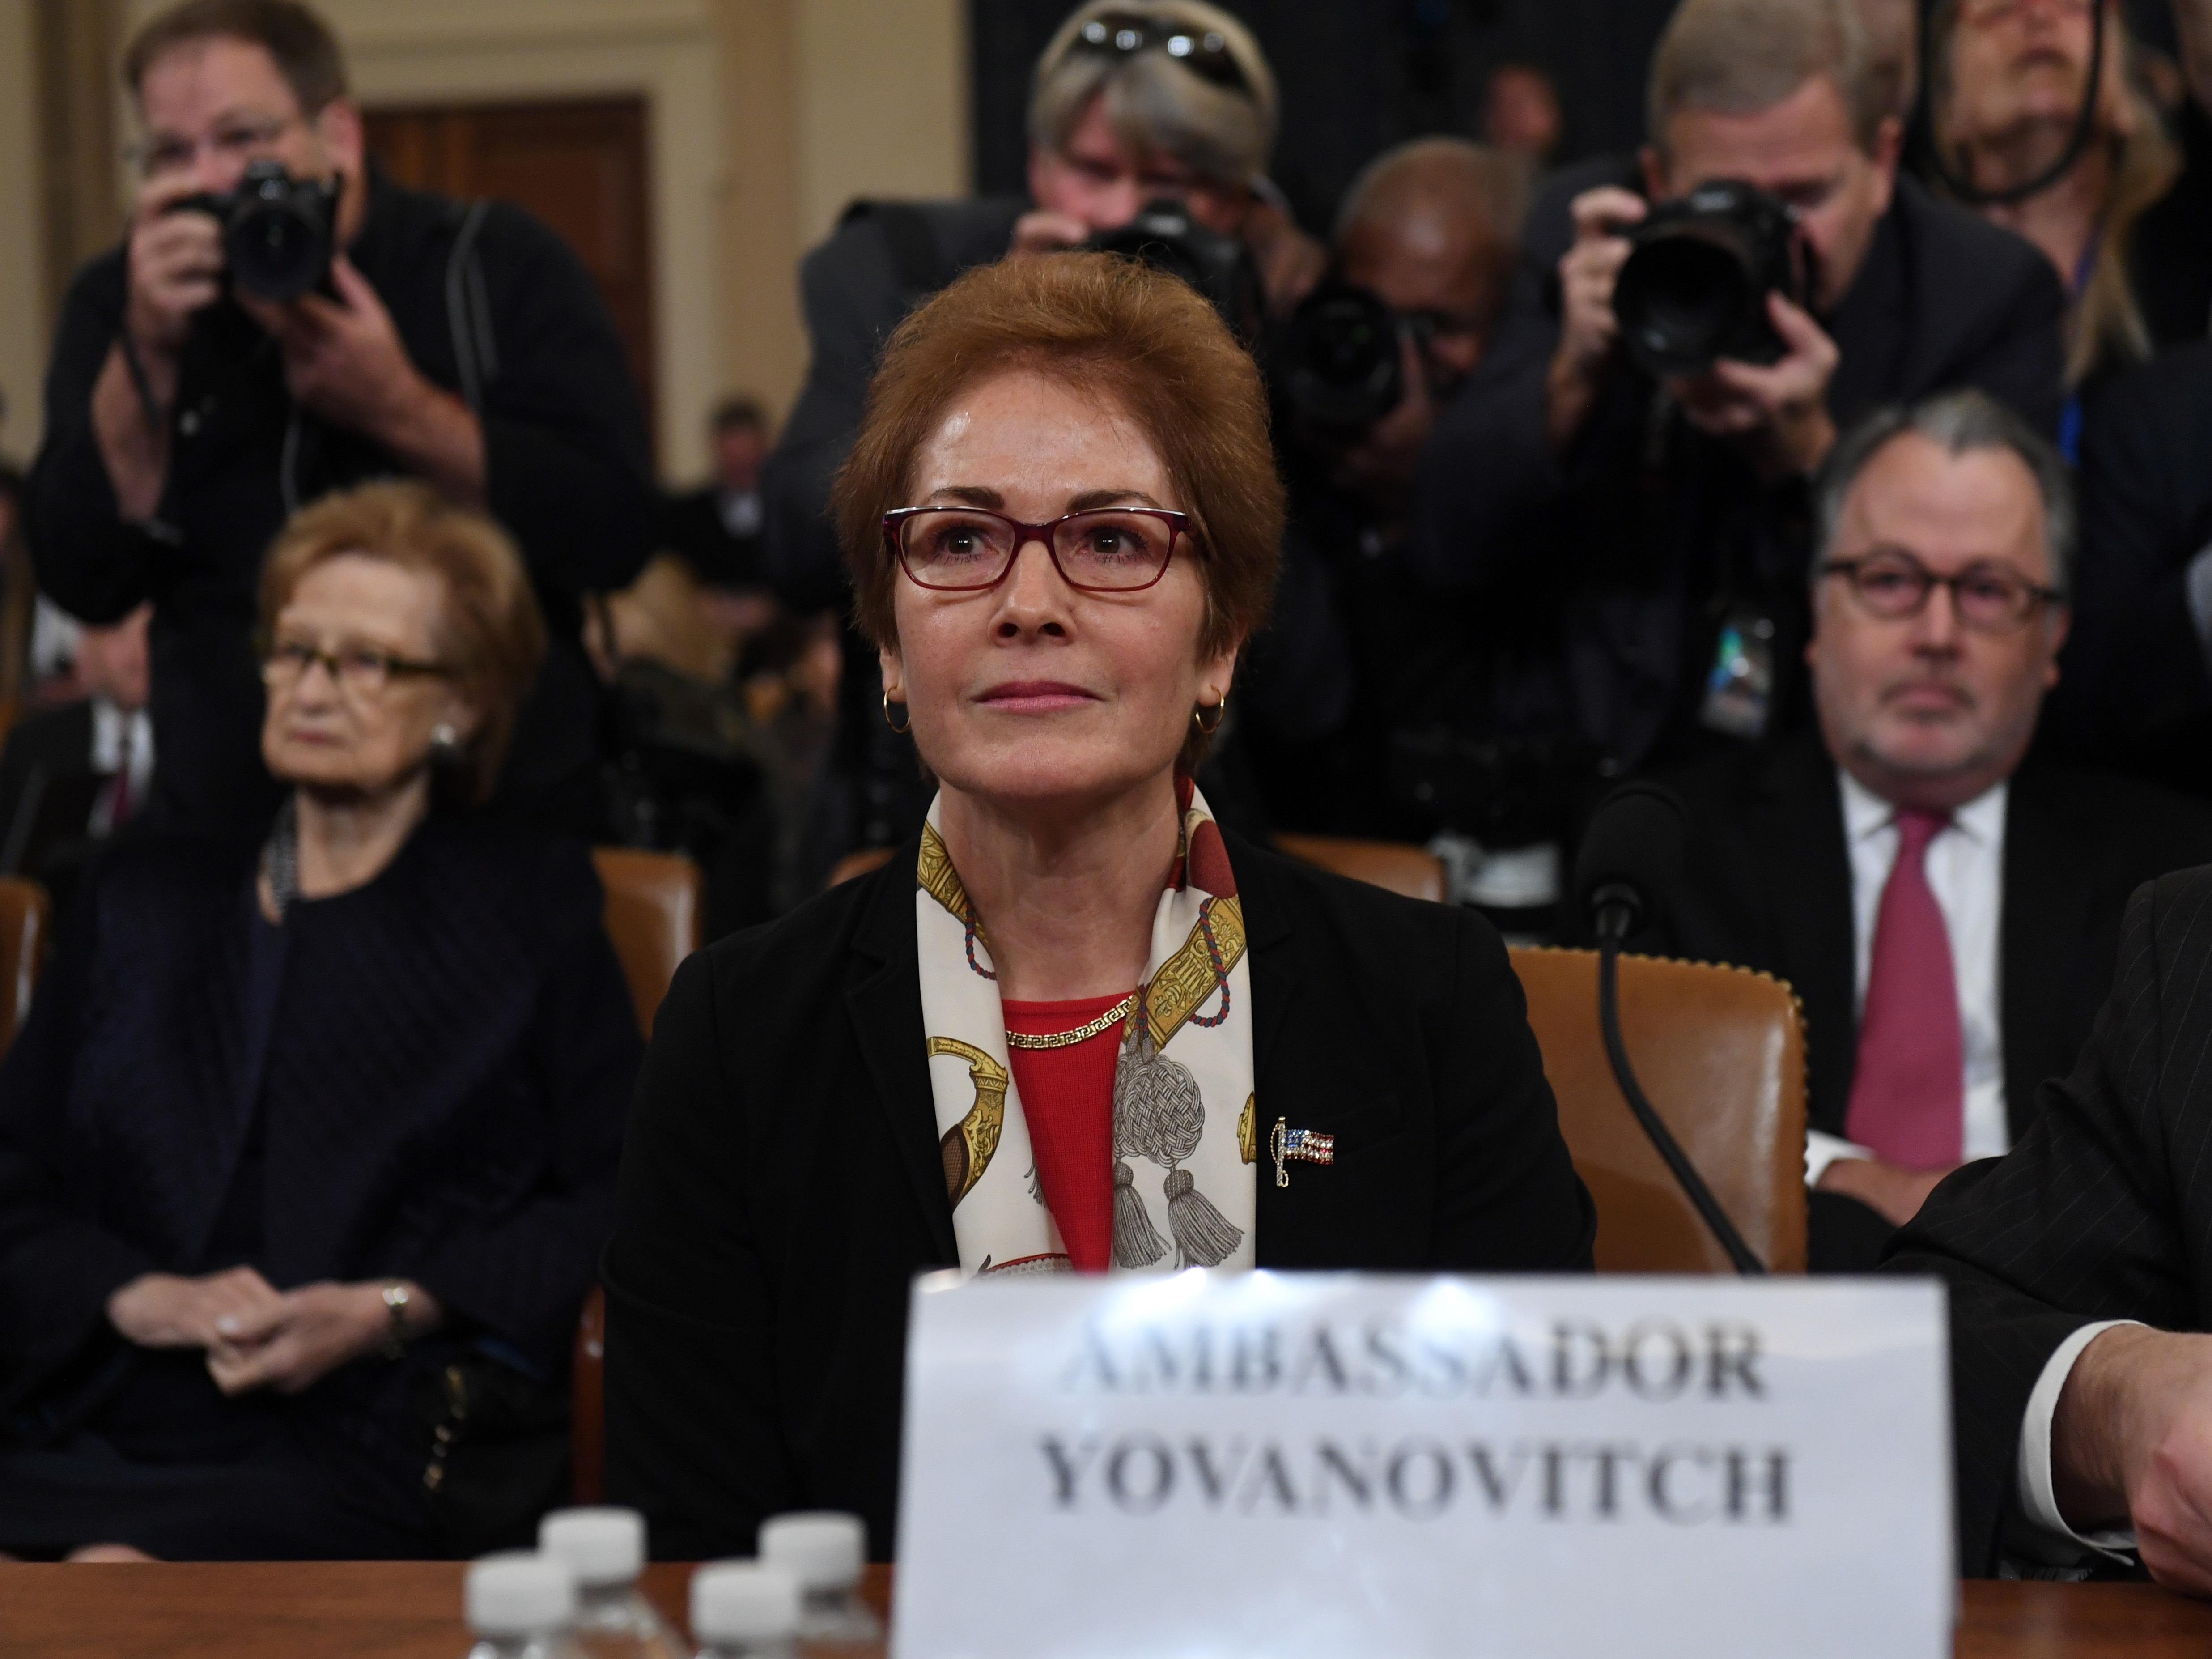 READ: Former Ambassador To Ukraine Yovanovitch's Opening Statement To Congress